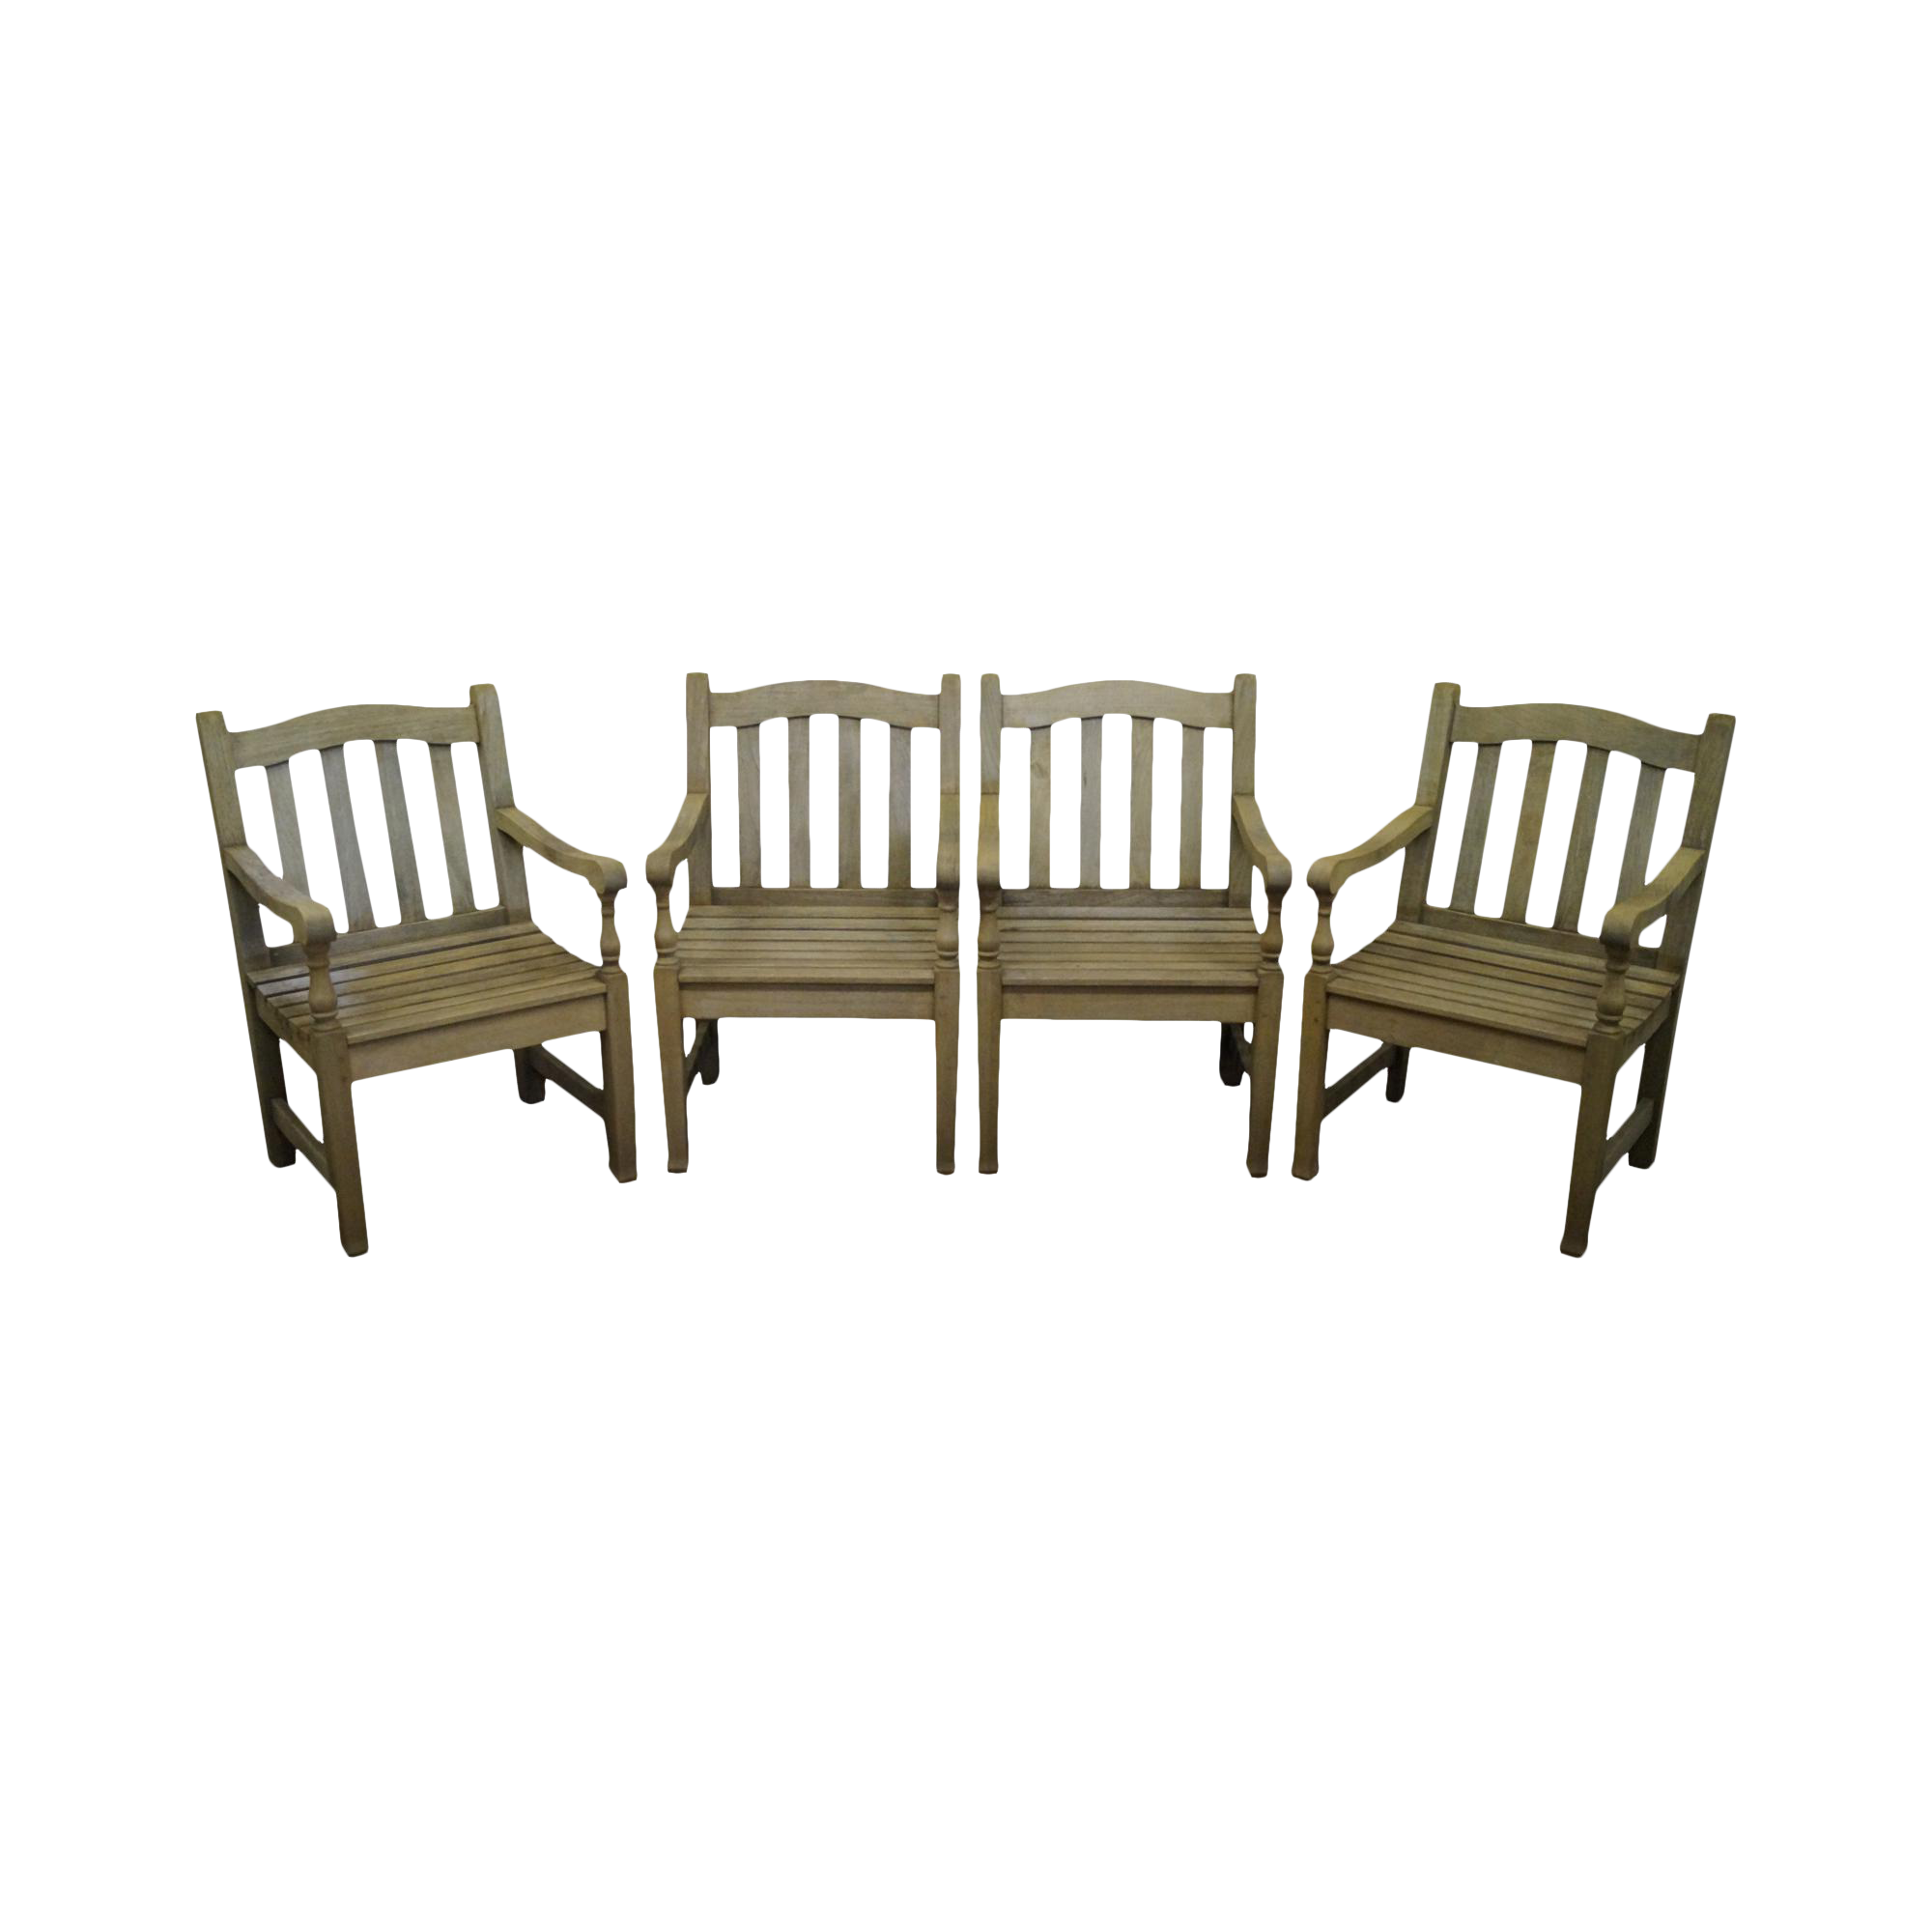 Barlow Tyrie Teak Outdoor Waveney Arm Chairs   Set Of 4